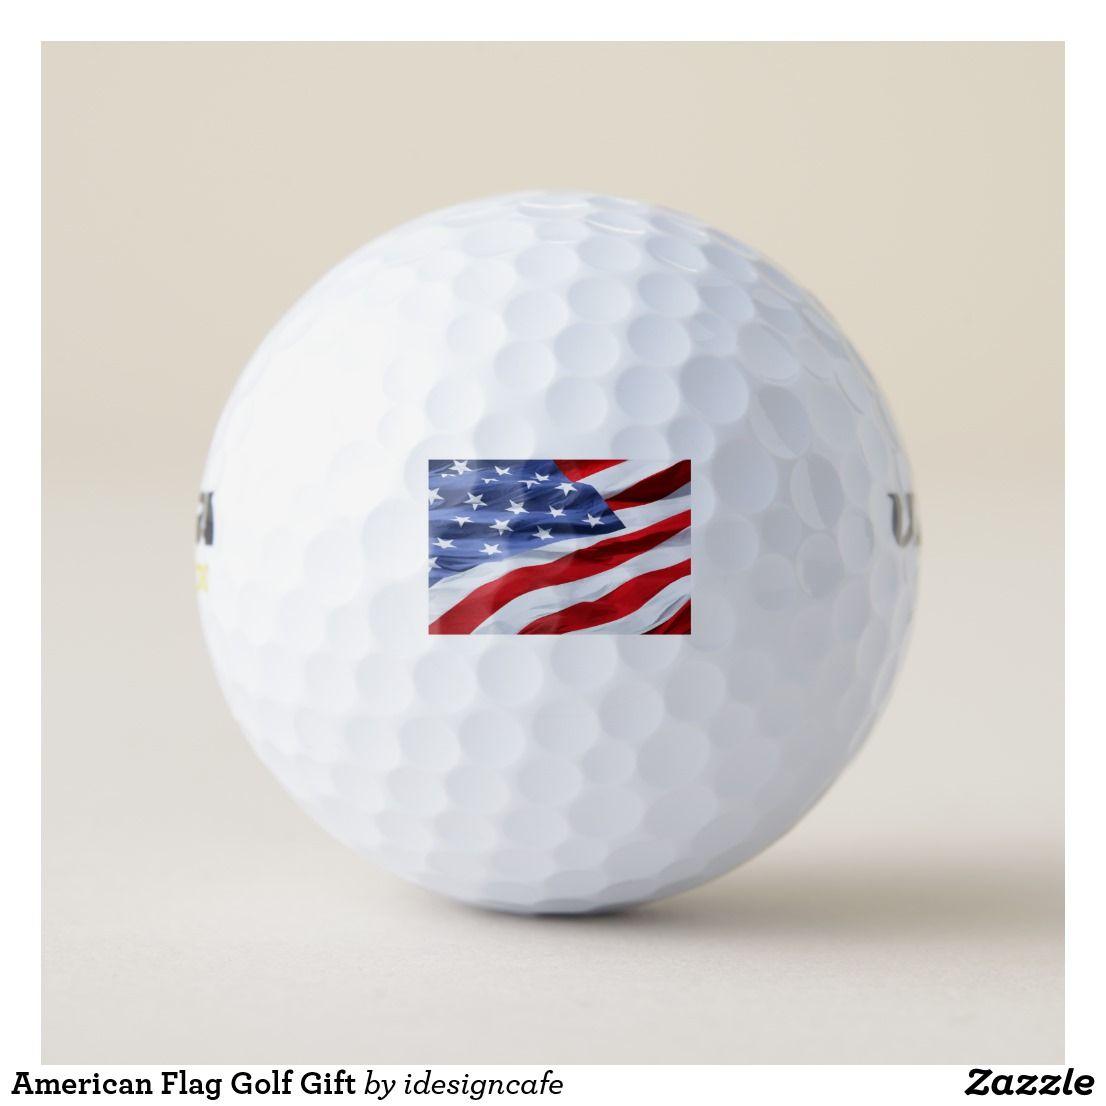 American flag golf gift golf balls golf